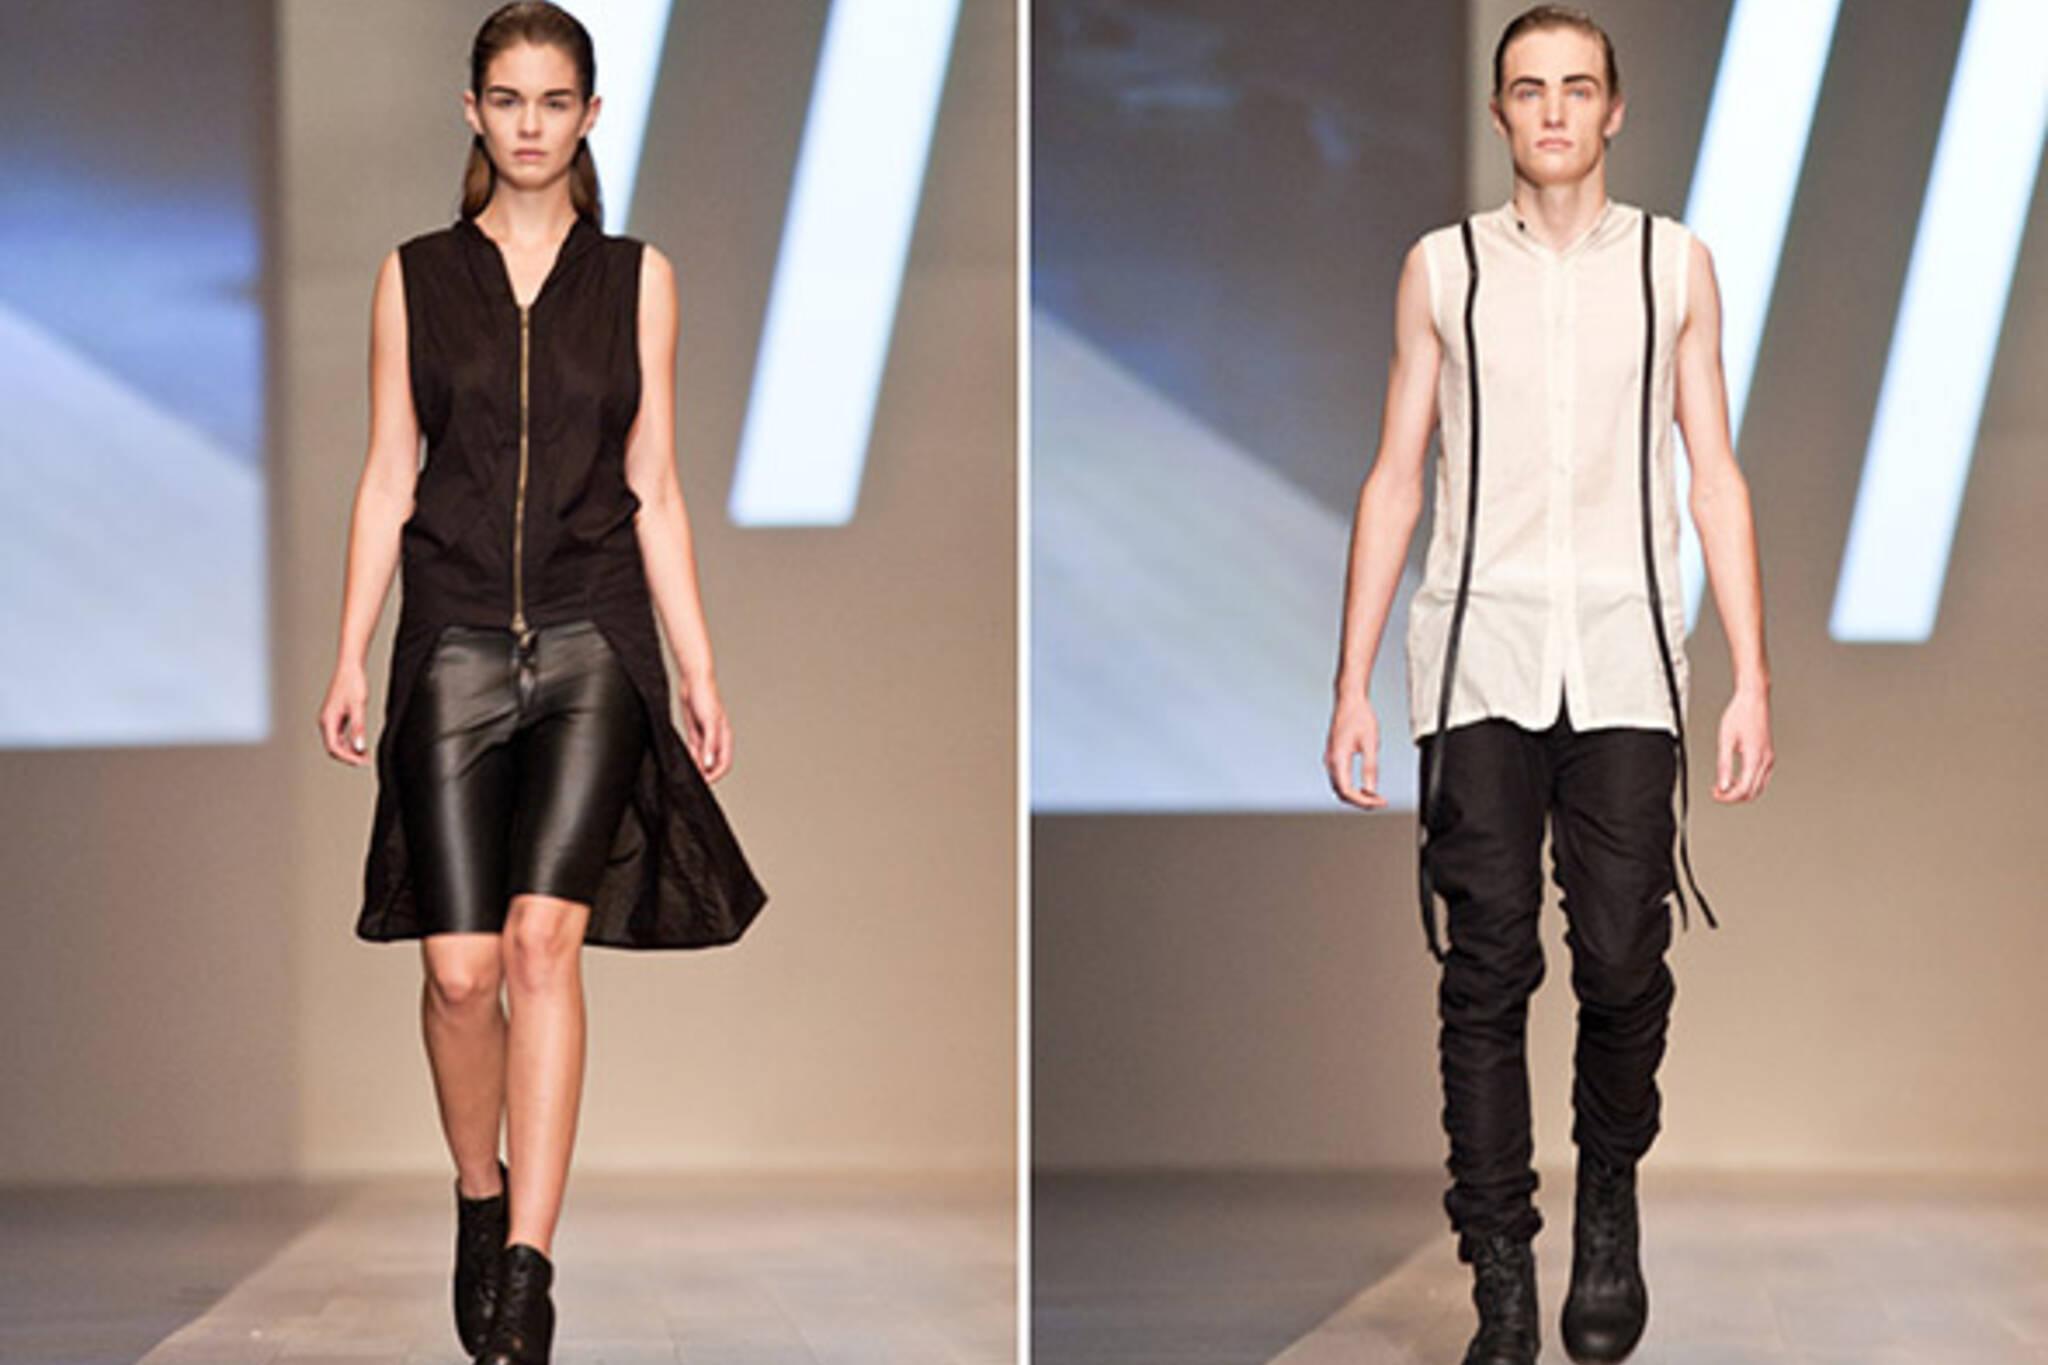 Thomas Toronto Fashion Week